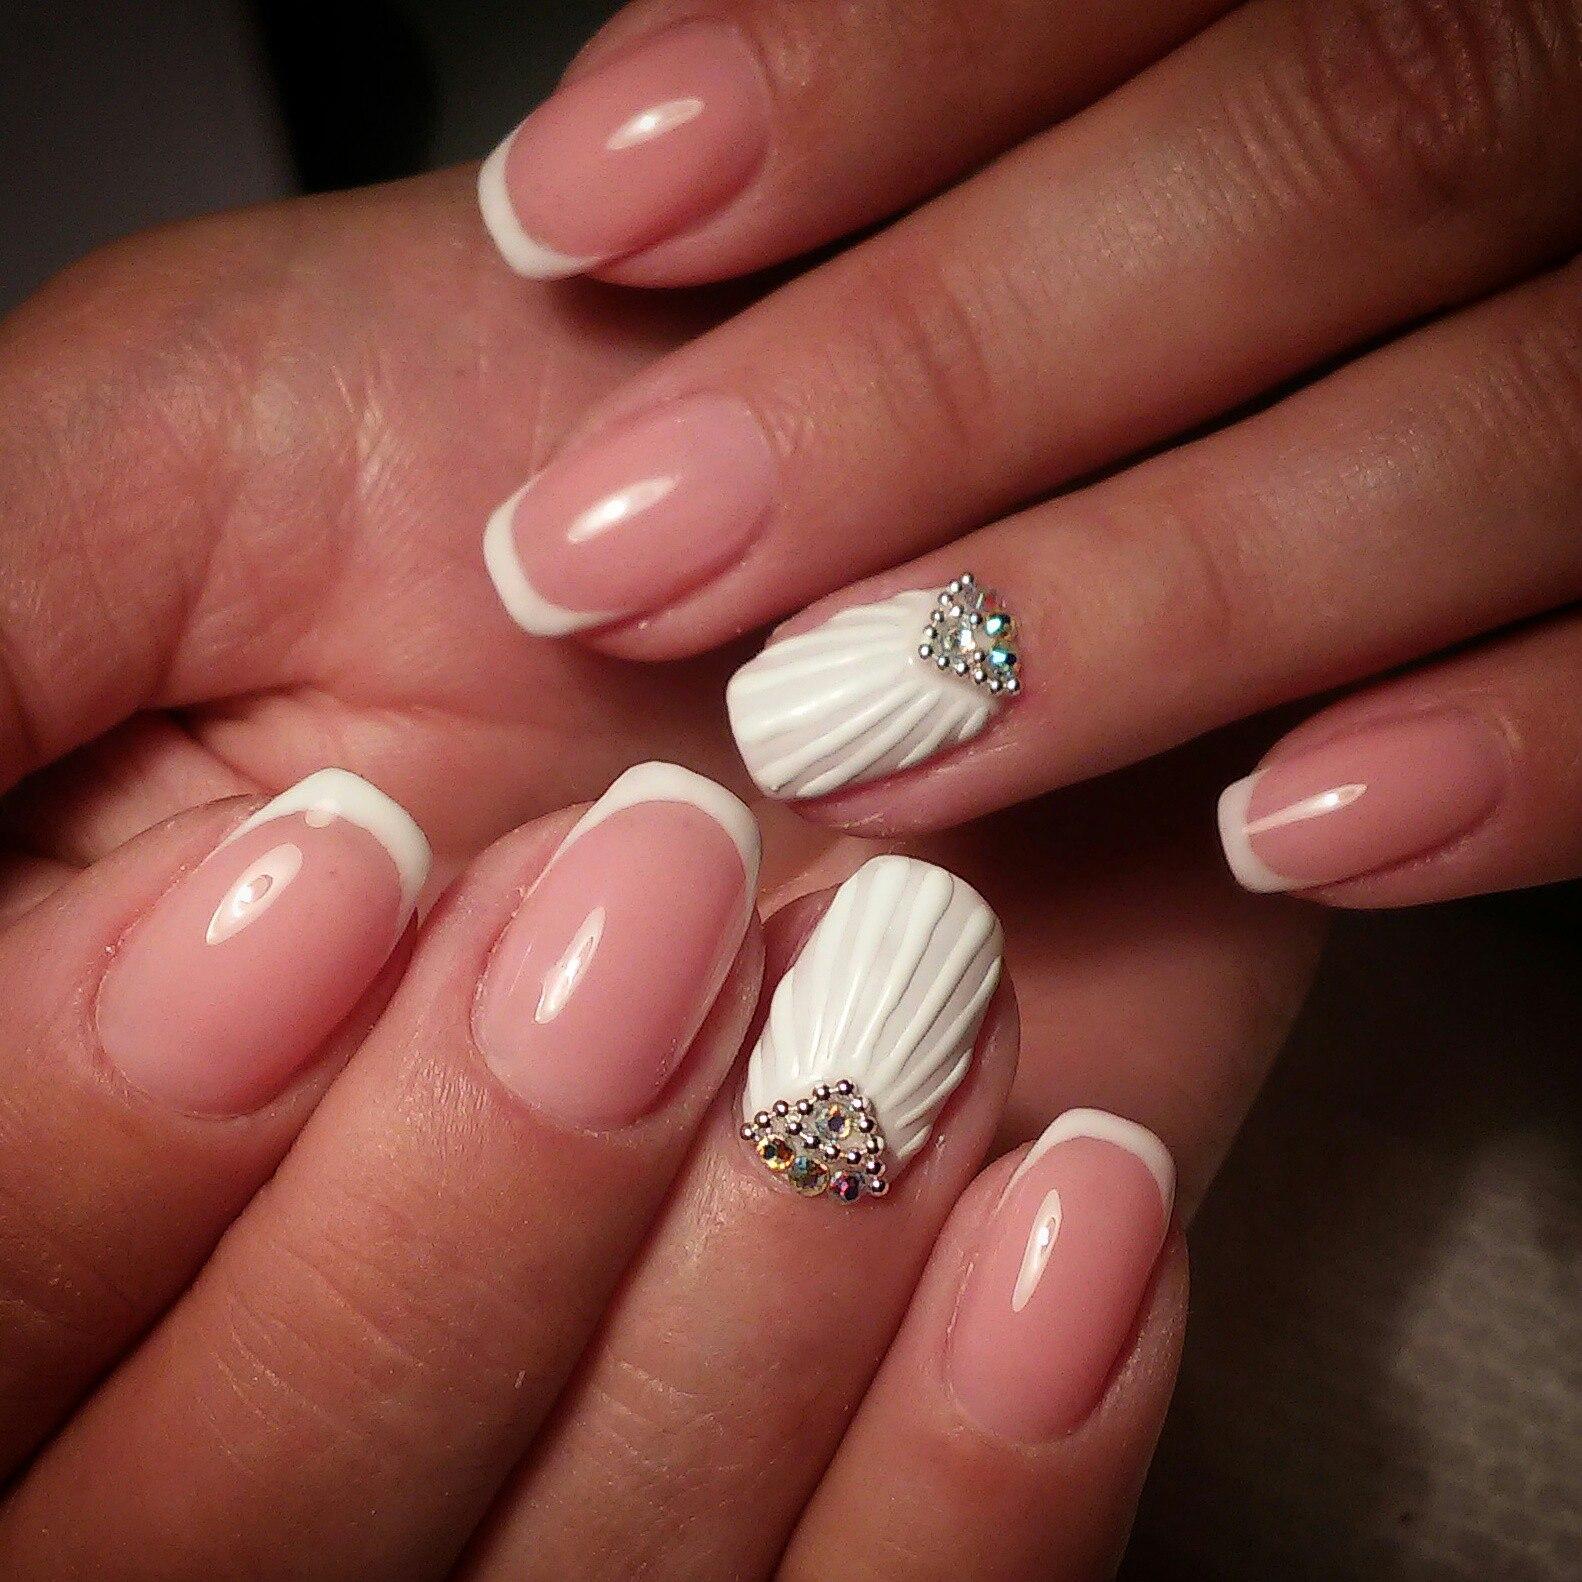 Дизайн «Ракушки» на ногтях гель-лаком 61